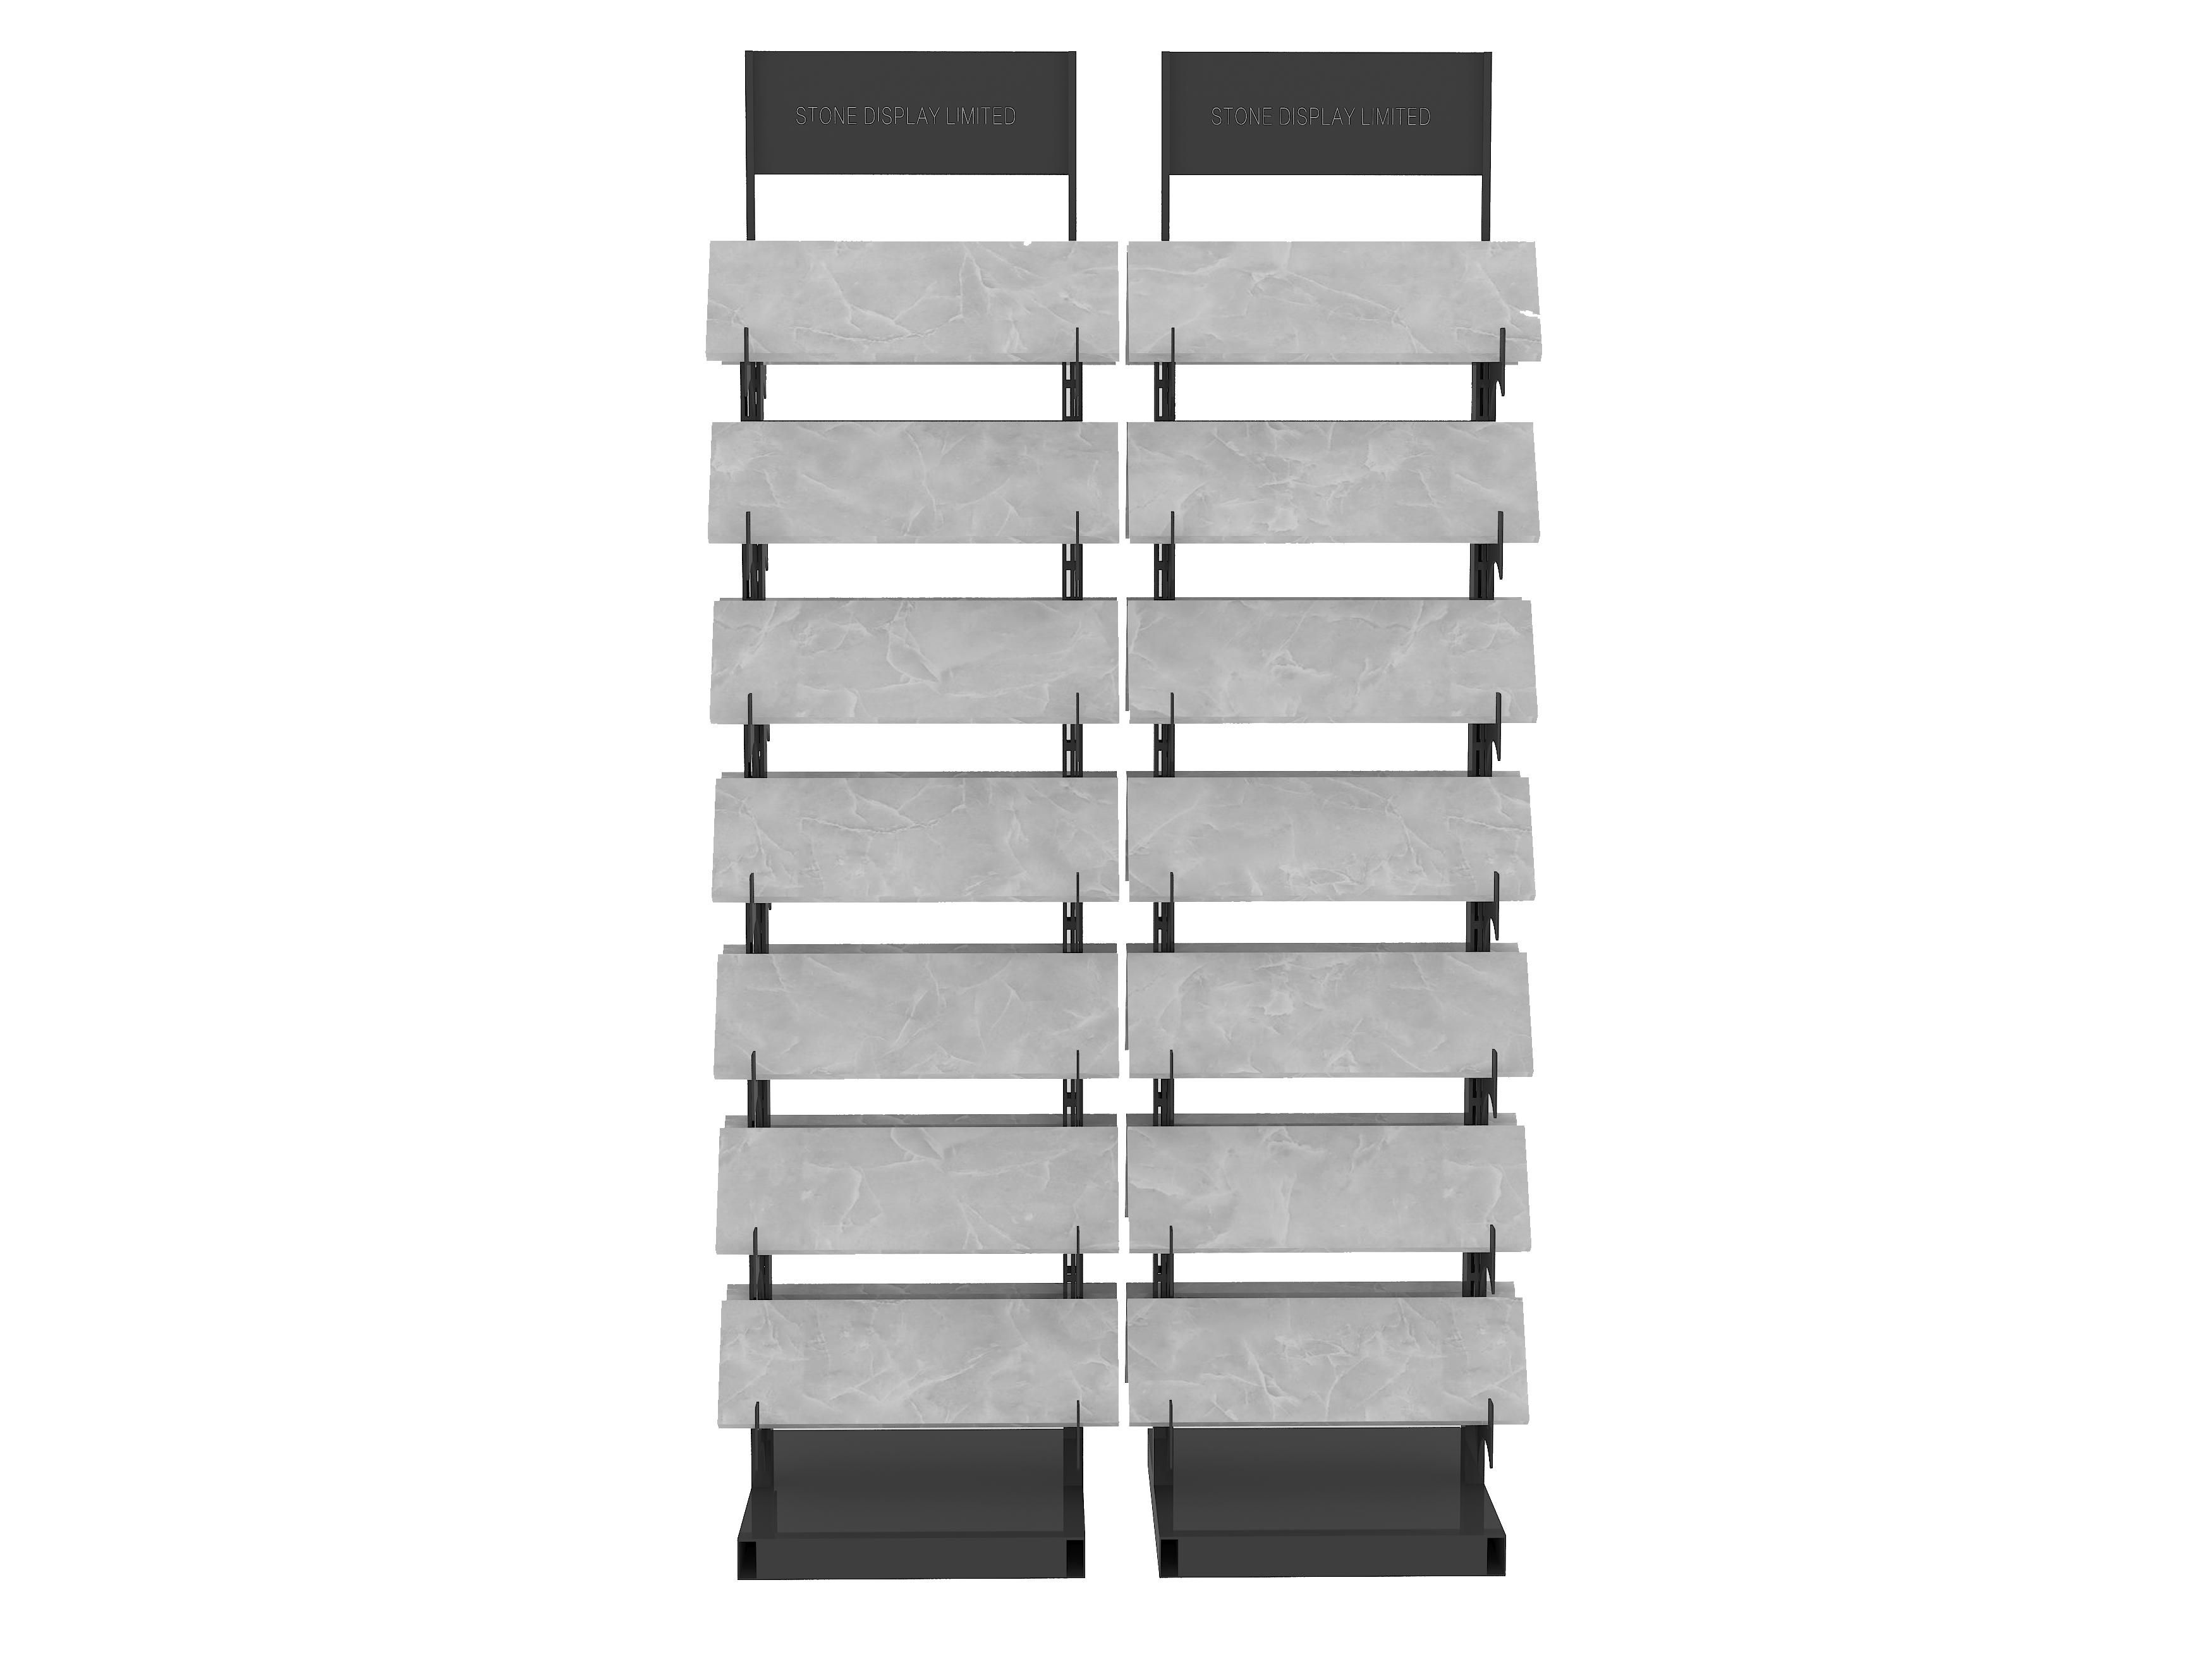 custom-cut-tile-showroom-ideas-rock-displays-ST-30-2